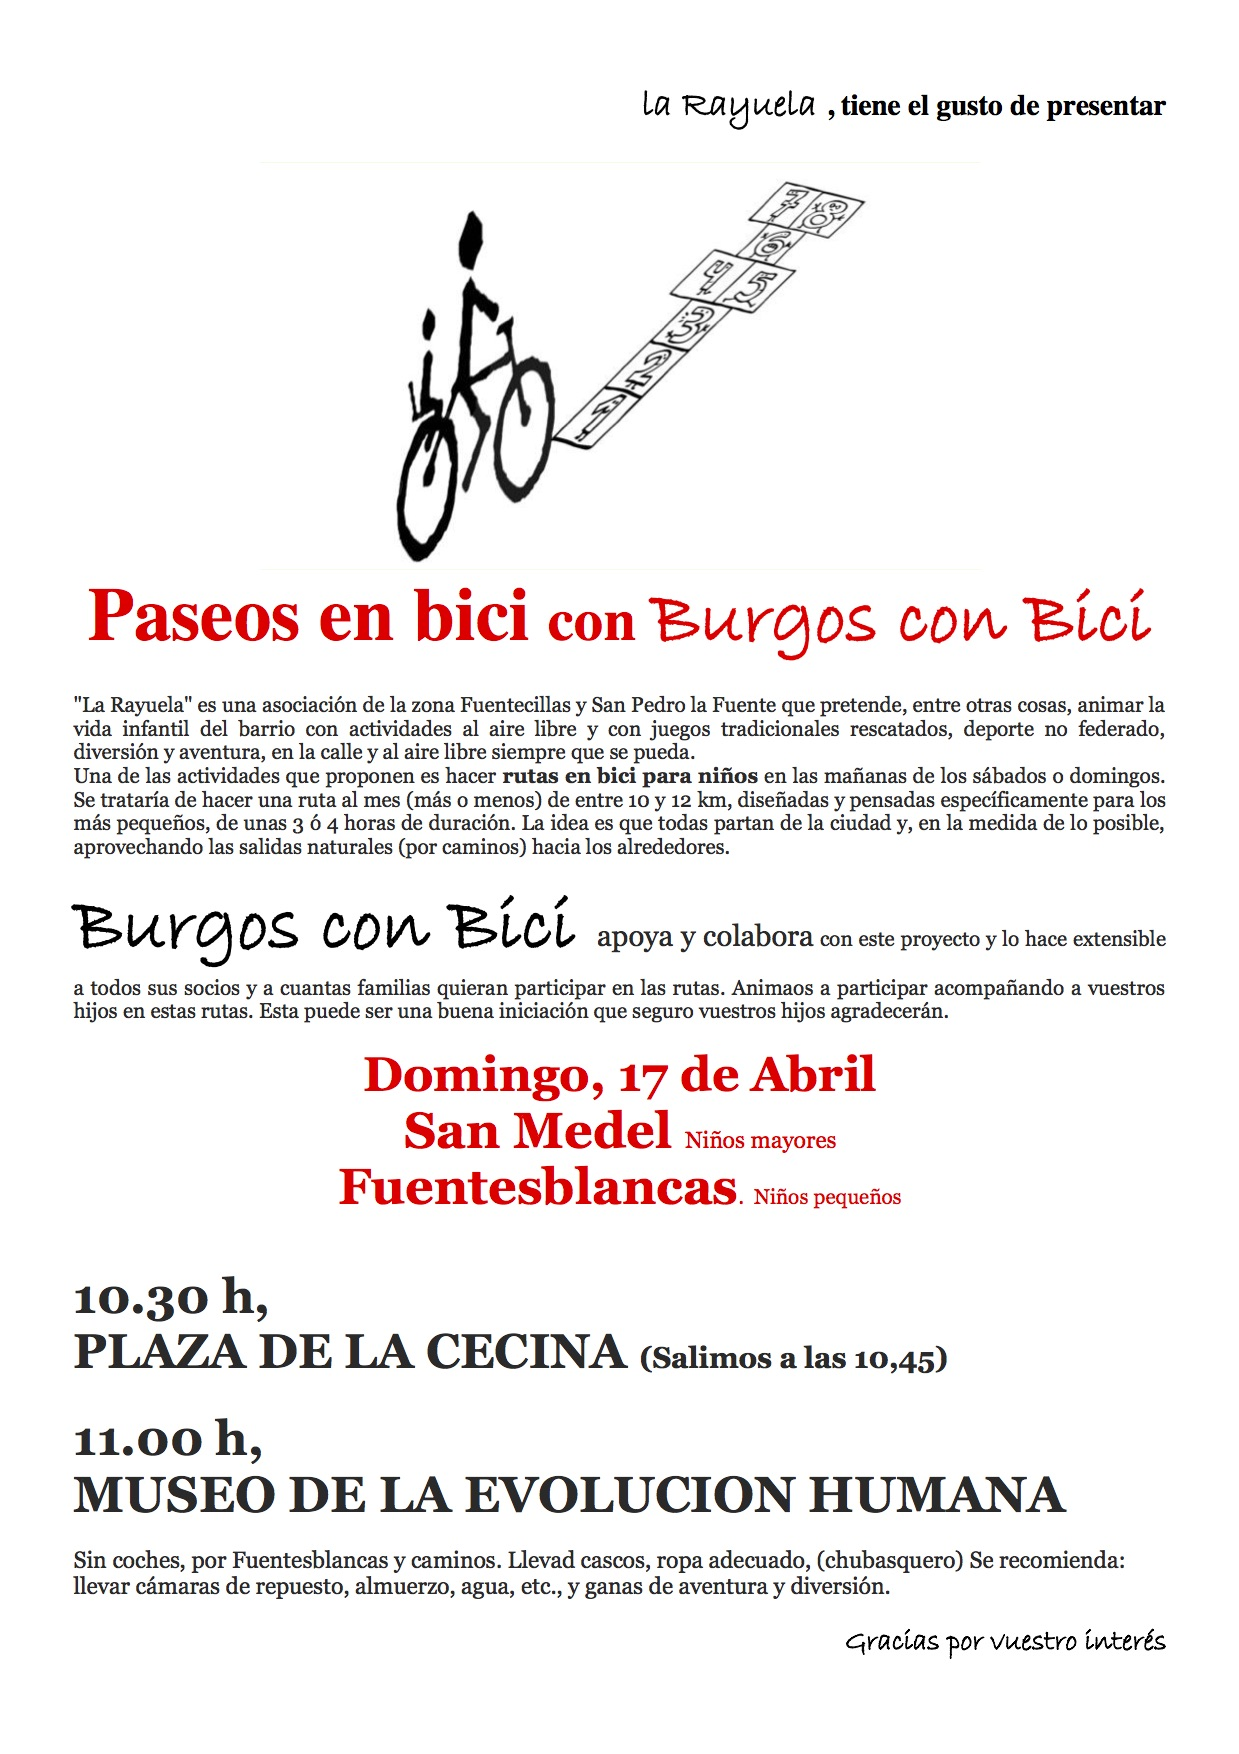 Cartel de la  III Ruta La Rayuela BCB. San Medel